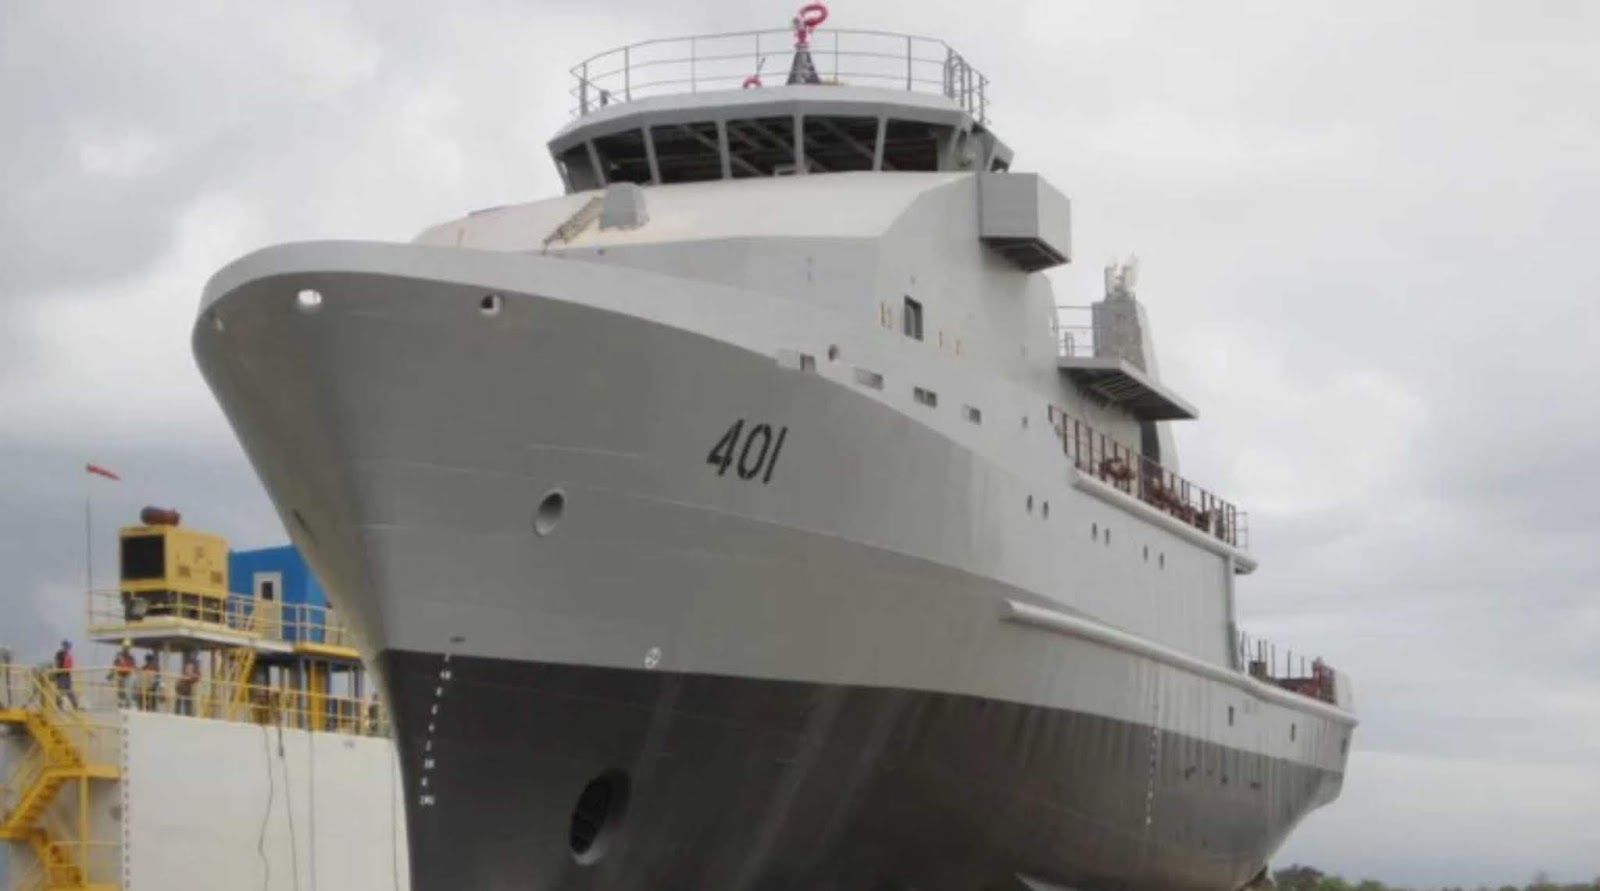 Angkatan Laut AS akan mempercepat penciptaan kendaraan permukaan tak berawak besar